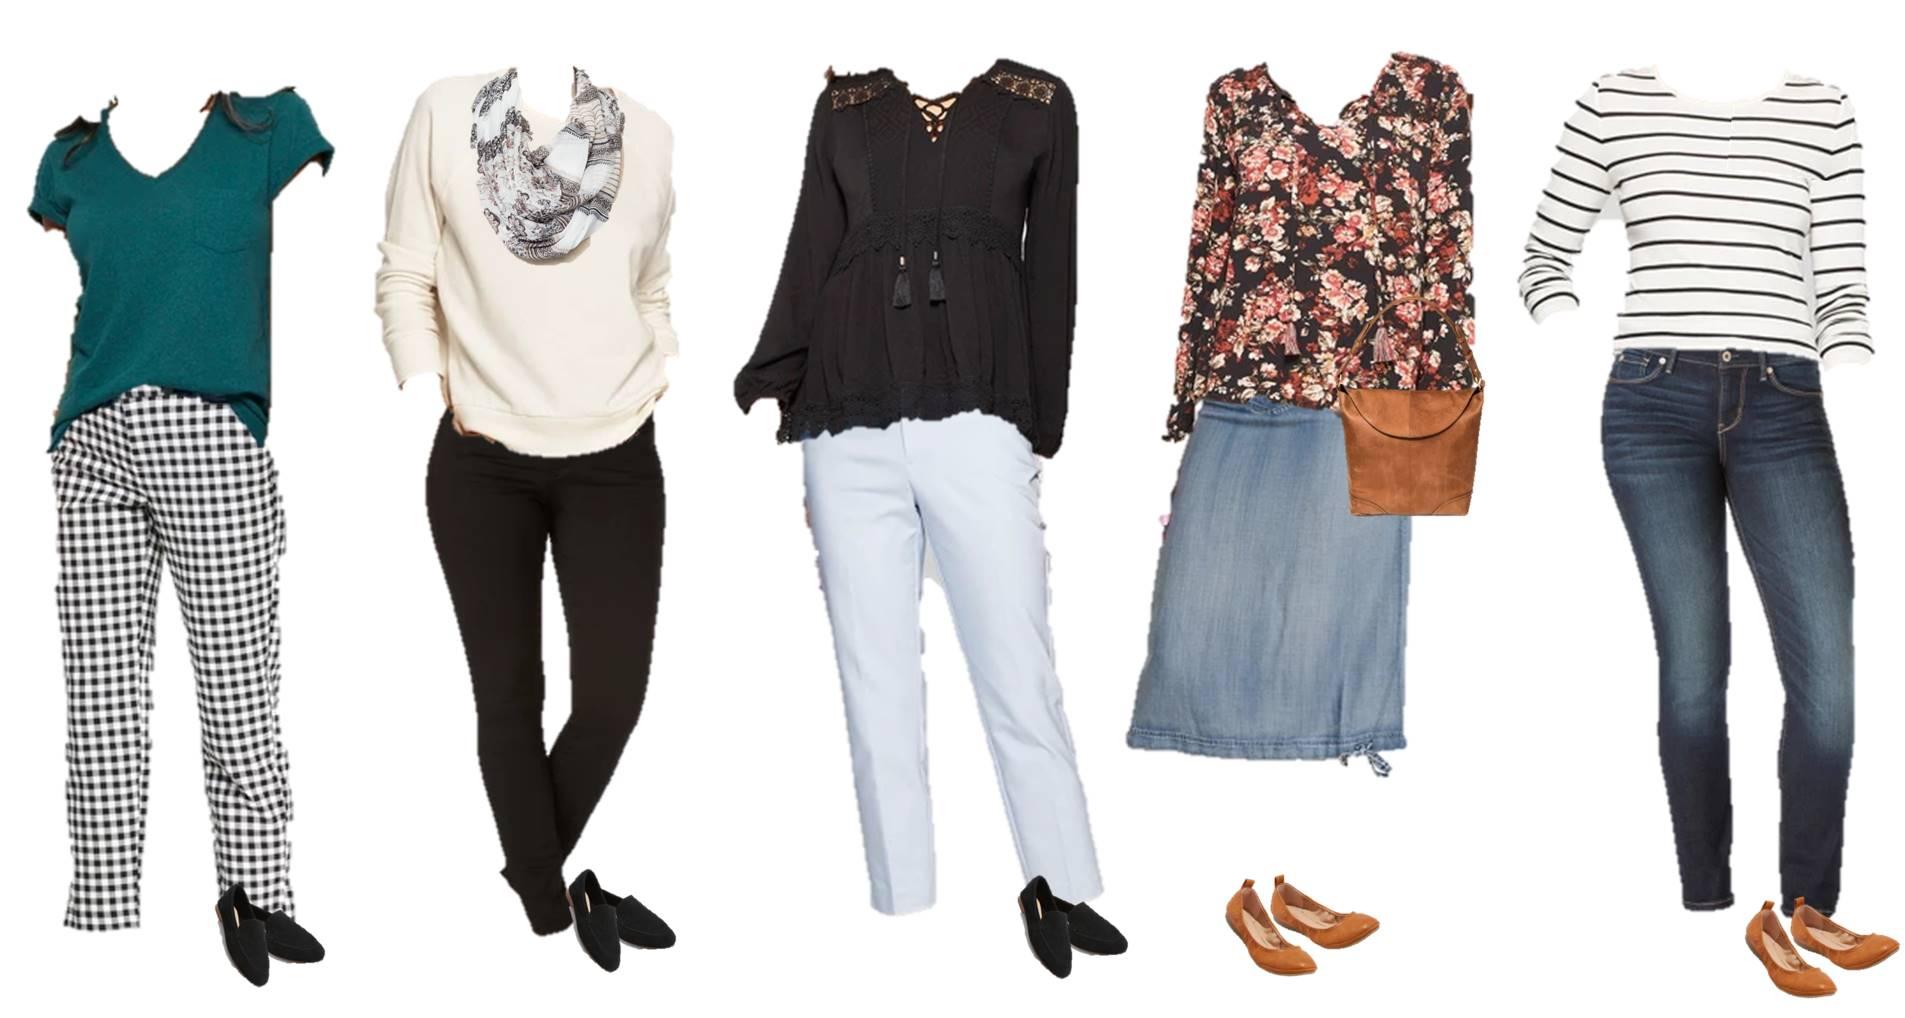 spring wardrobe from Target